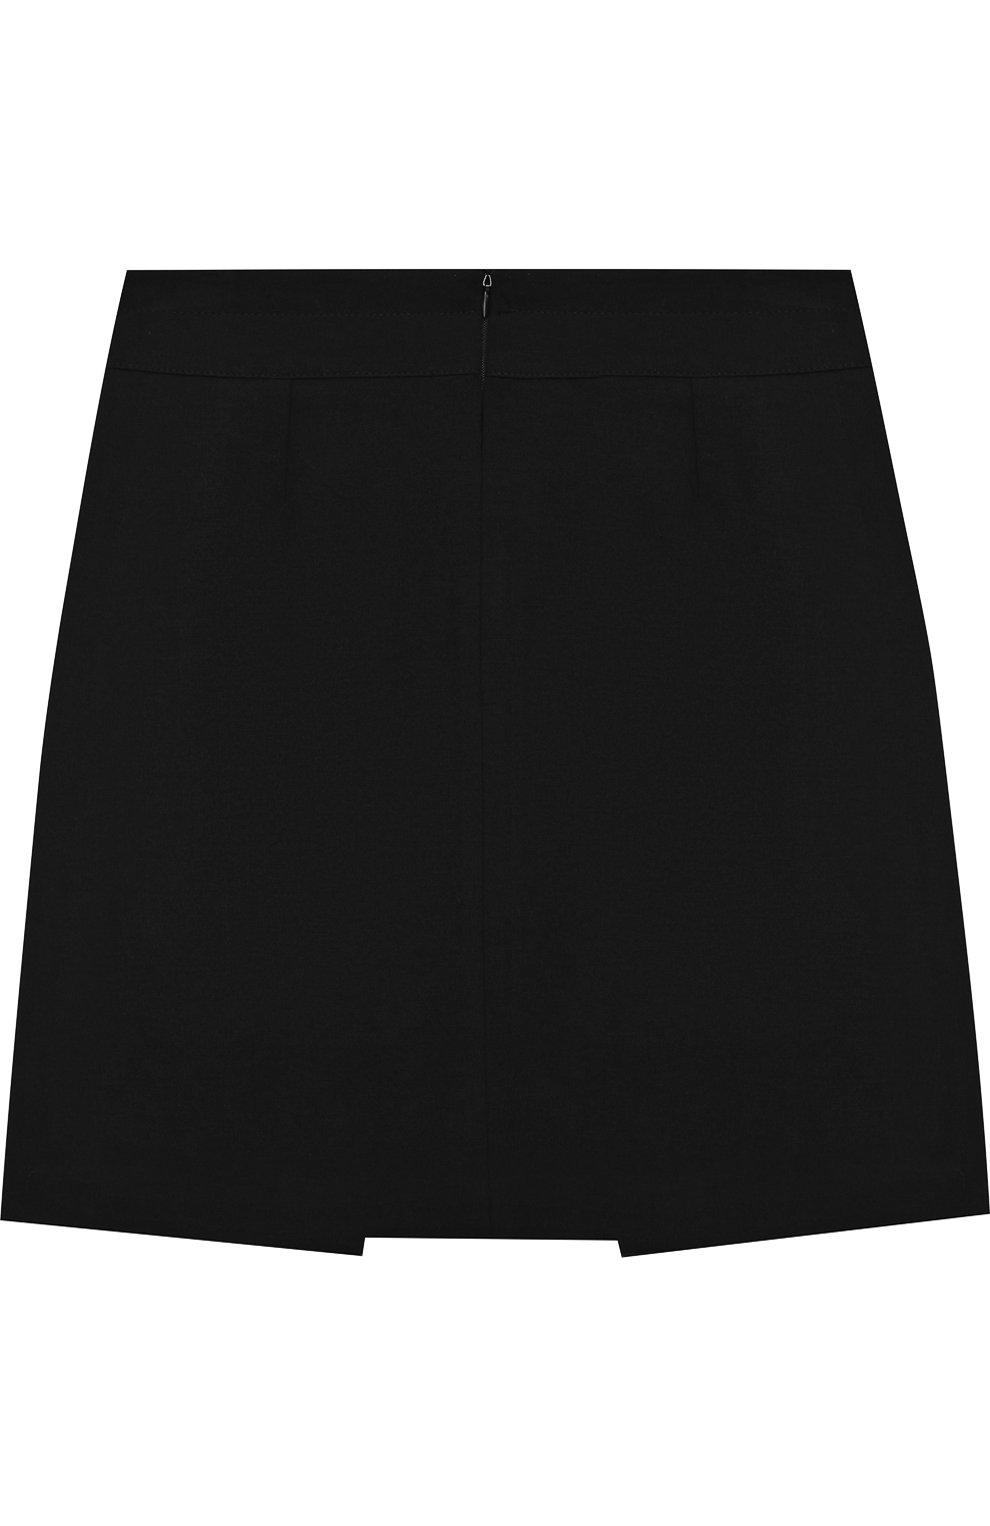 Мини-юбка джерси с декоративными пуговицами | Фото №2